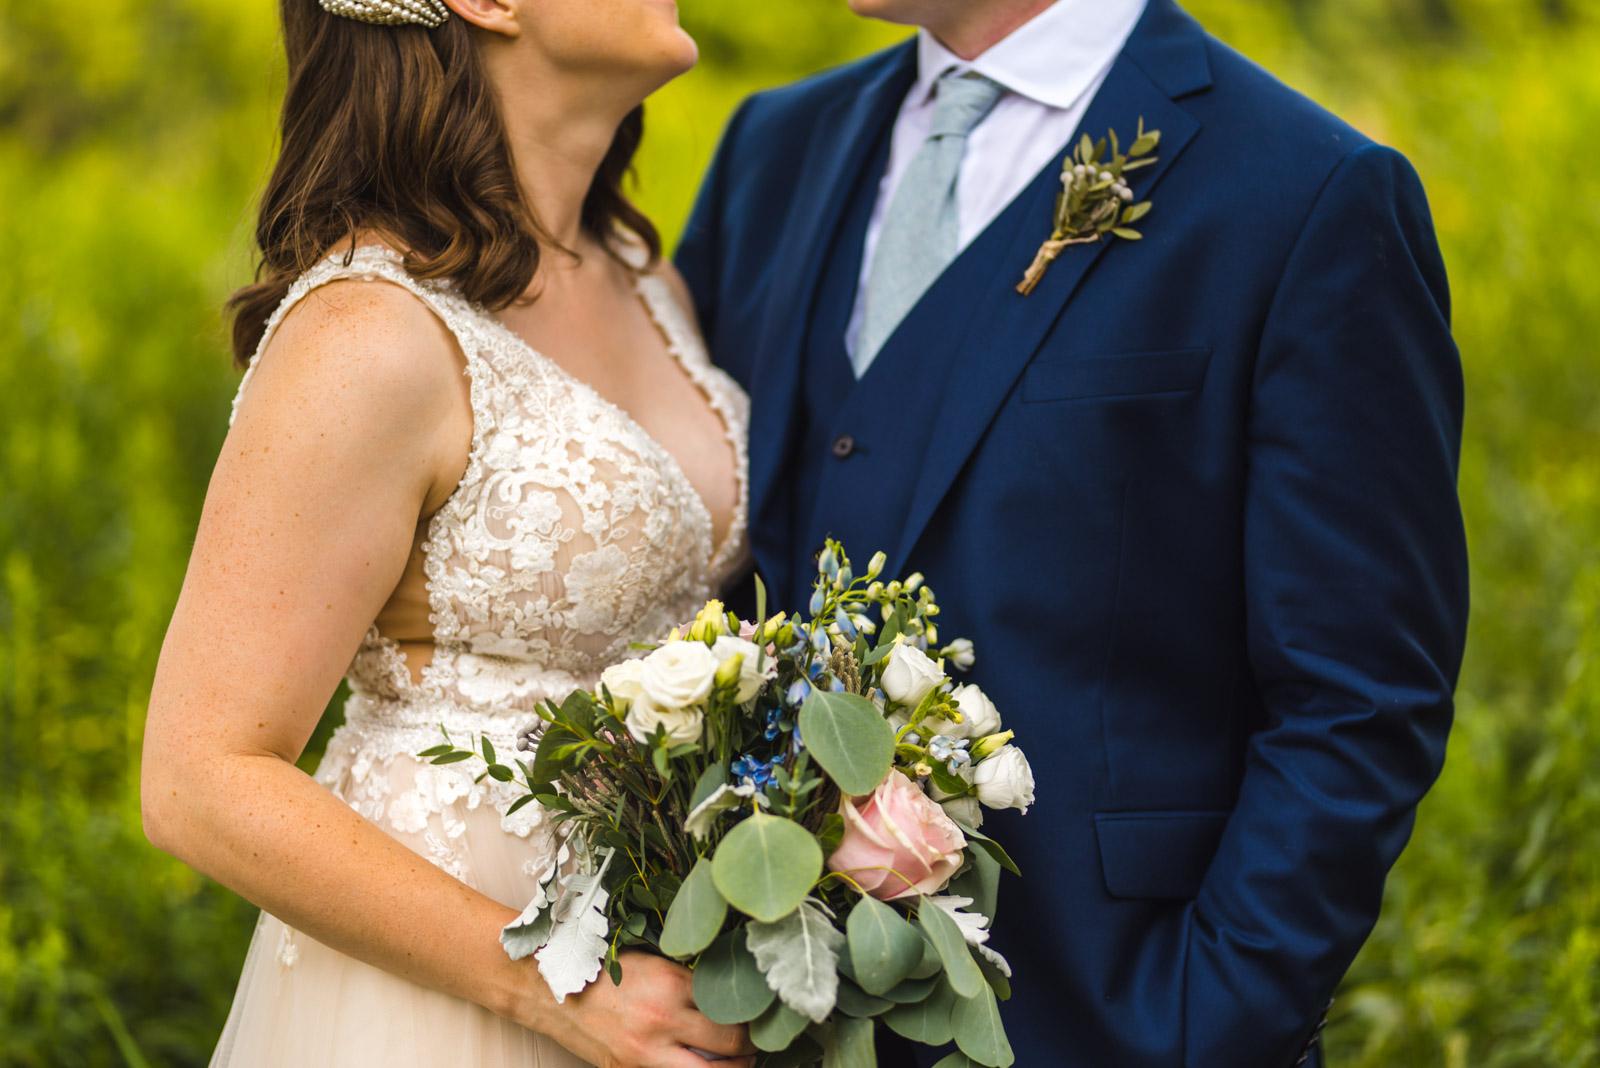 Emerson & Elicia's Golf Course Wedding Aidan & Leanne Hennebry Hamilton Wedding Videographers Photographers Niagara Hush Hush Photography & Film-46.jpg